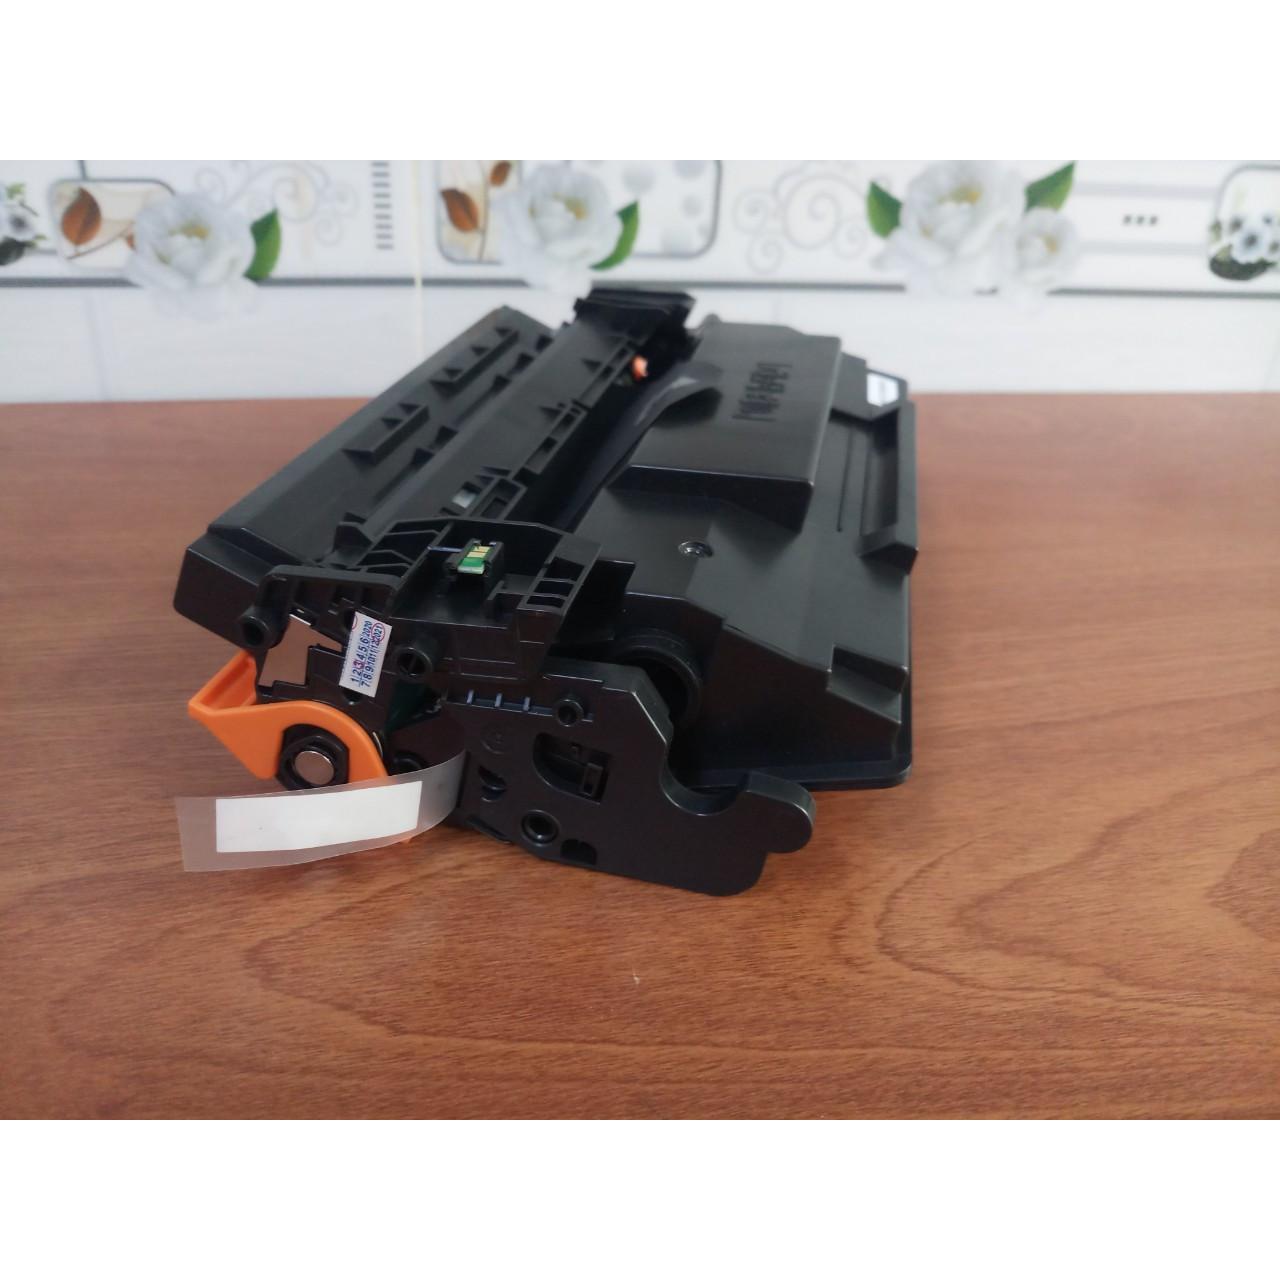 Hộp mực in HP 87A (CF 287A) dùng cho máy in HP Laserjet Pro M506dn, M506n, M506x, MFP M527dn, M527f, M527z, M501f